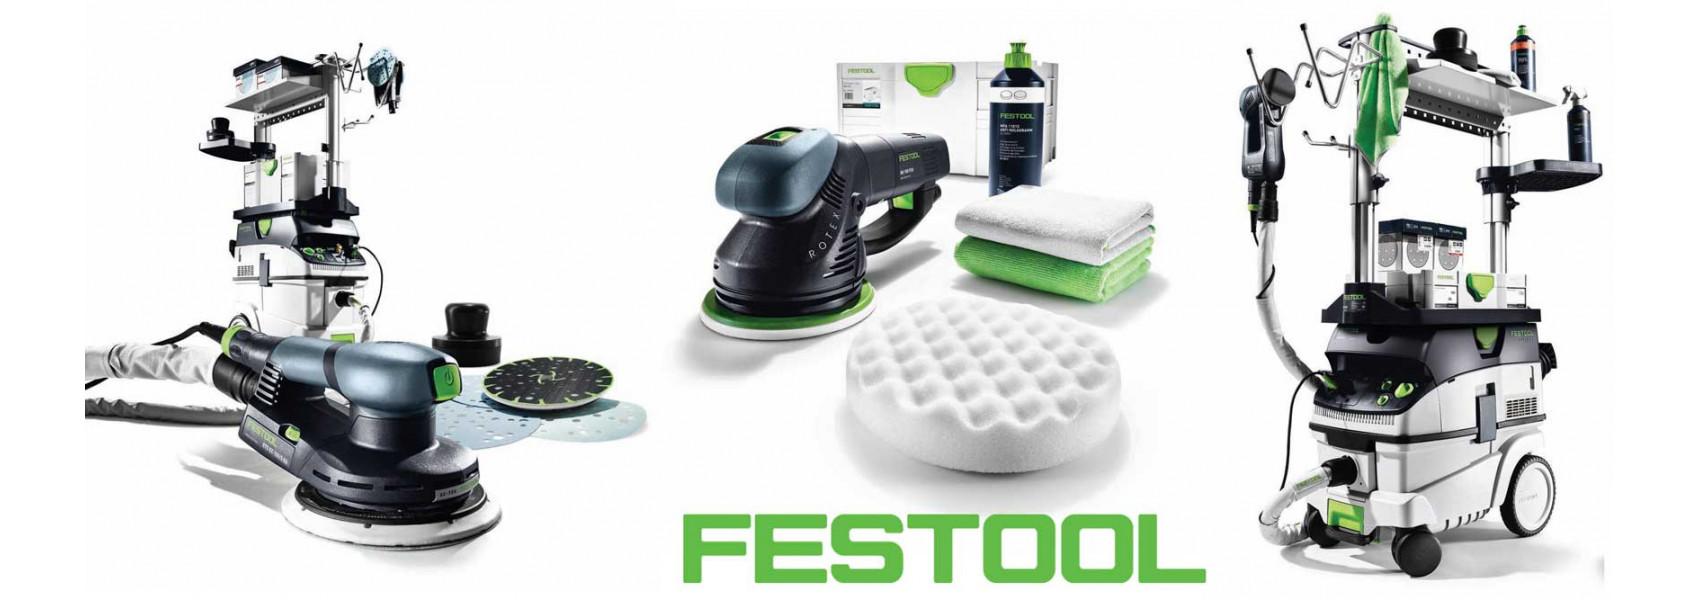 Festool Automotive